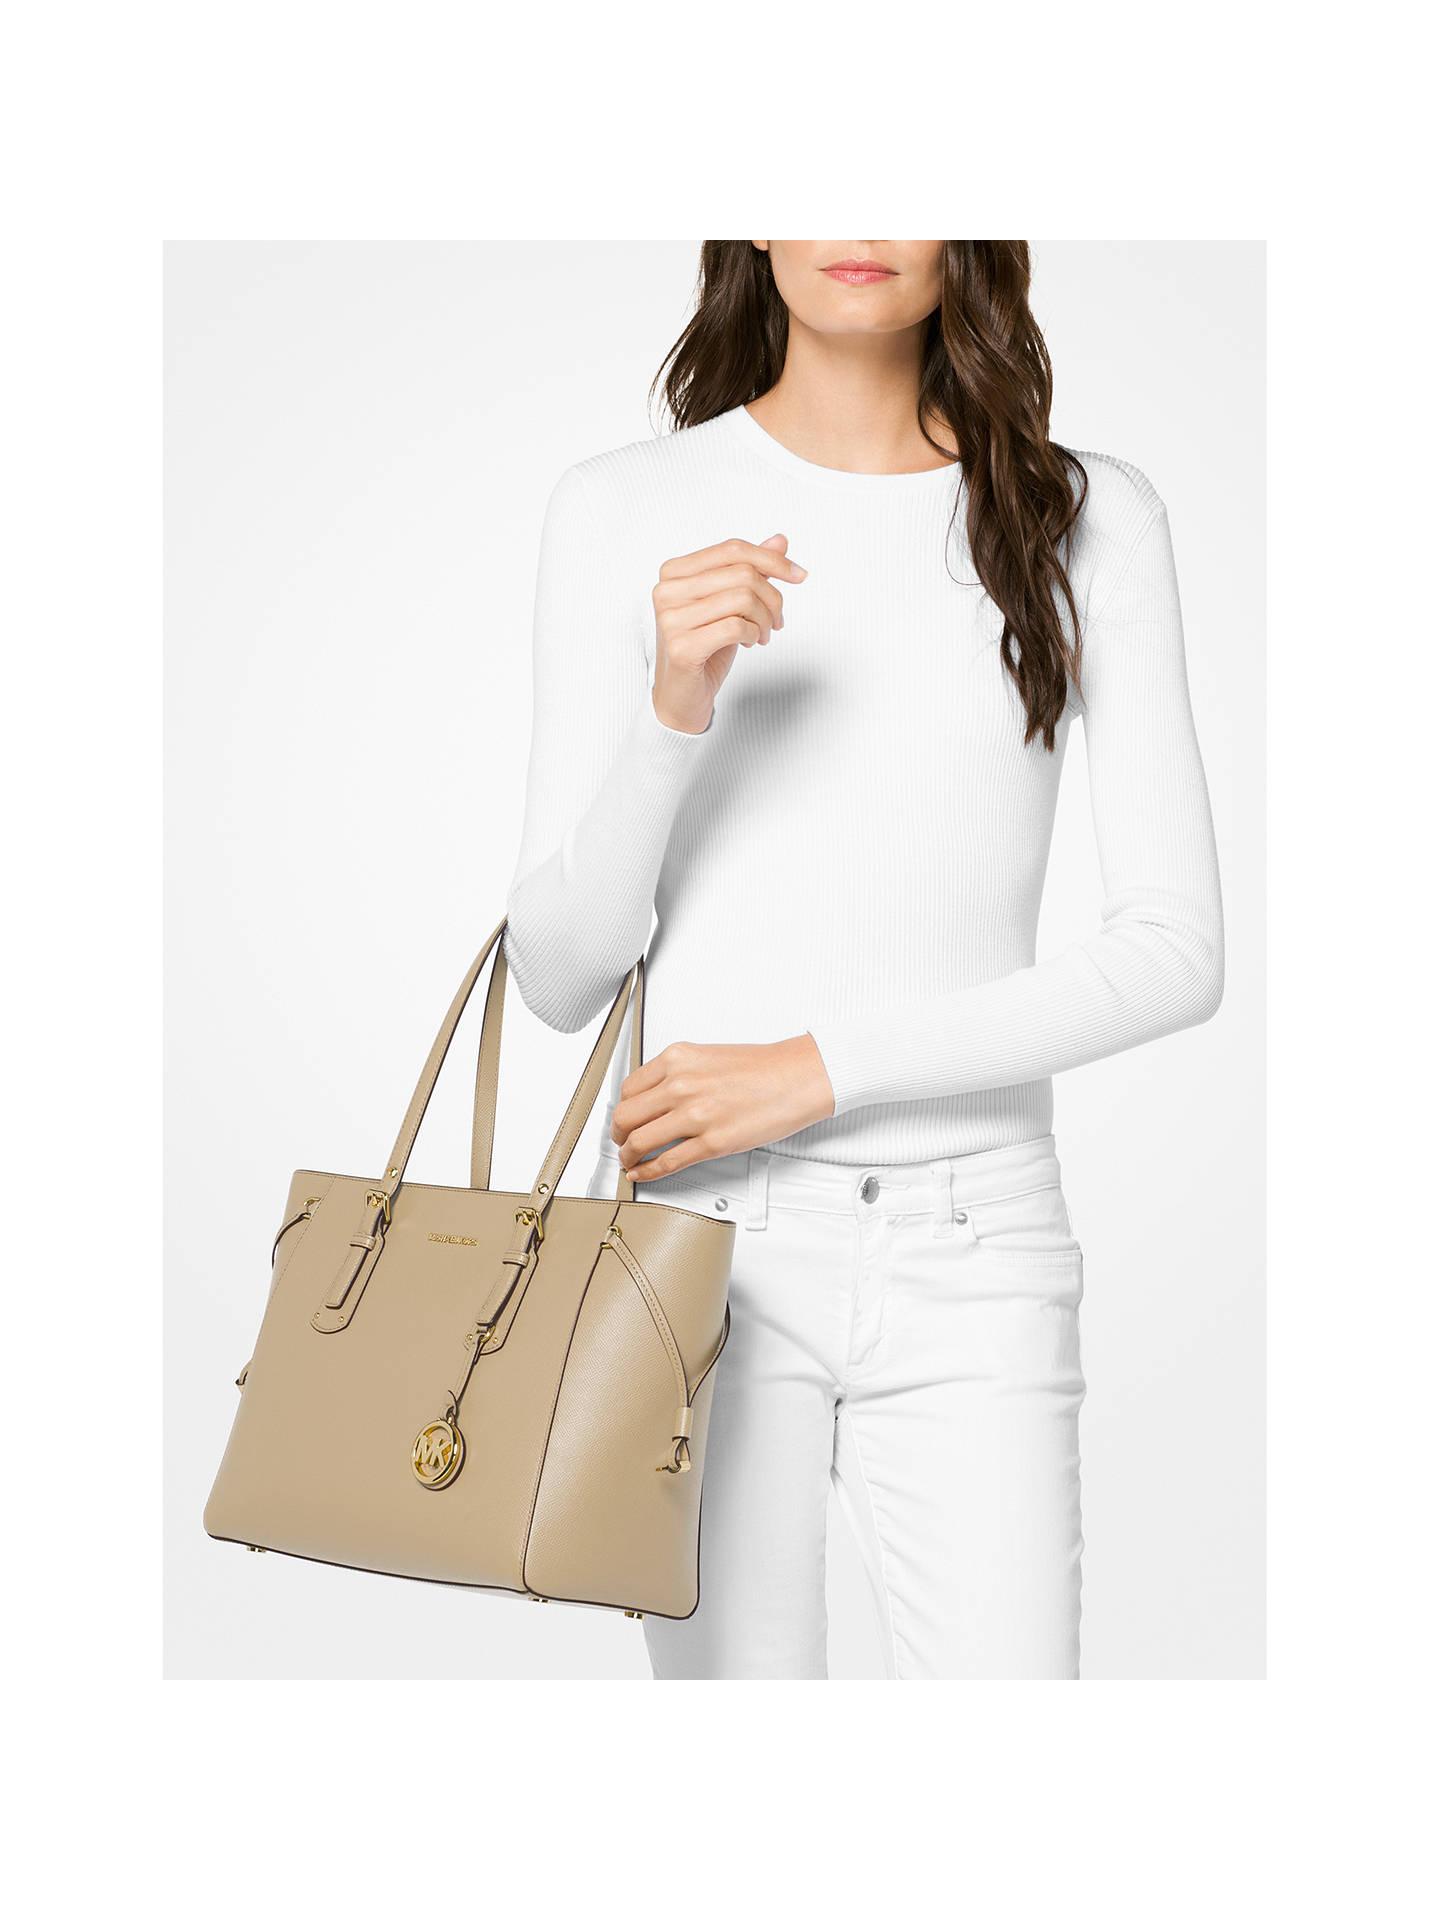 ab96619052f0 ... Buy MICHAEL Michael Kors Voyager Leather Medium Tote Bag, Oat Online at  johnlewis.com